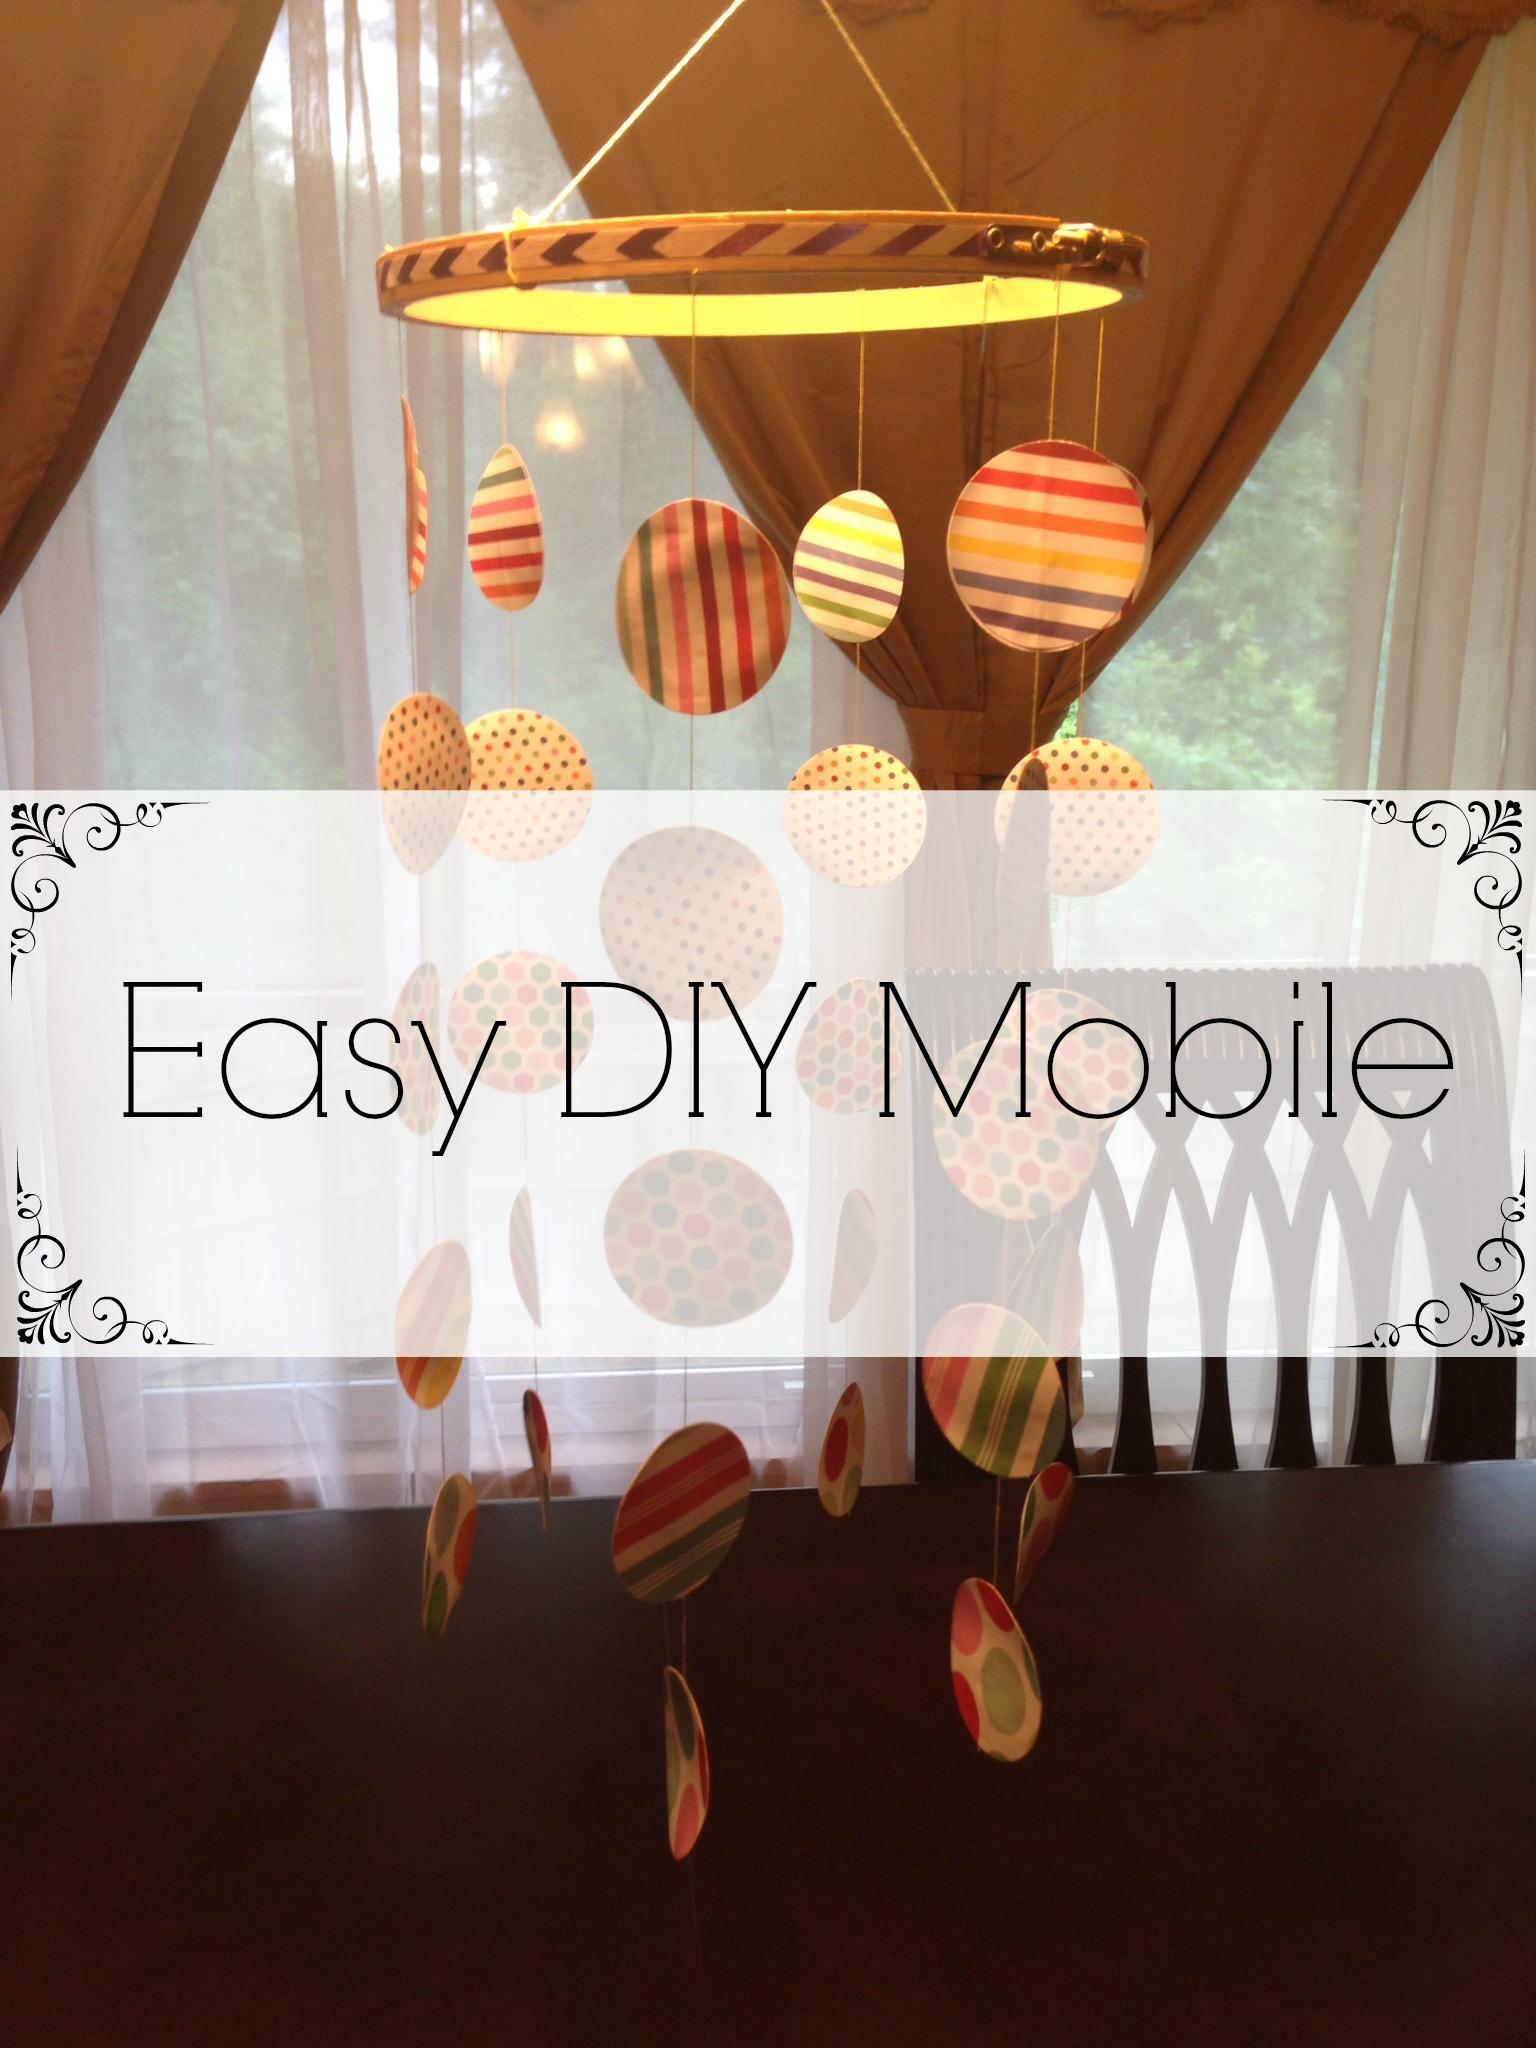 Easy DIY Mobile